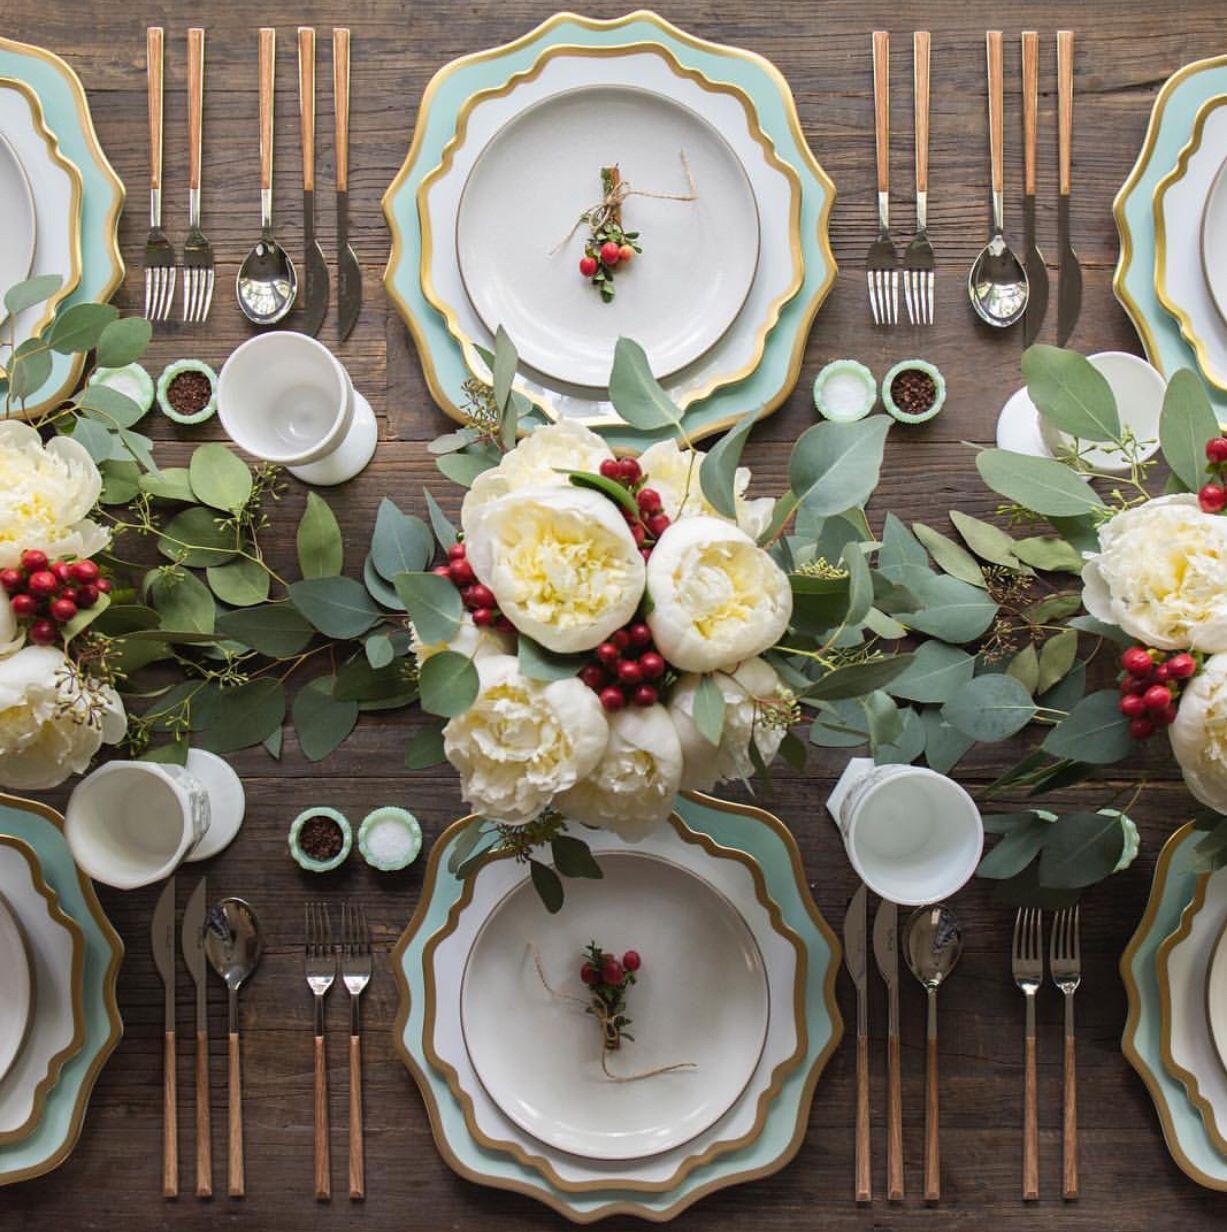 Instagram @casadeperrin & 25 Elegant Christmas Table Settings - Holiday Table Ideas \u0026 Centerpieces